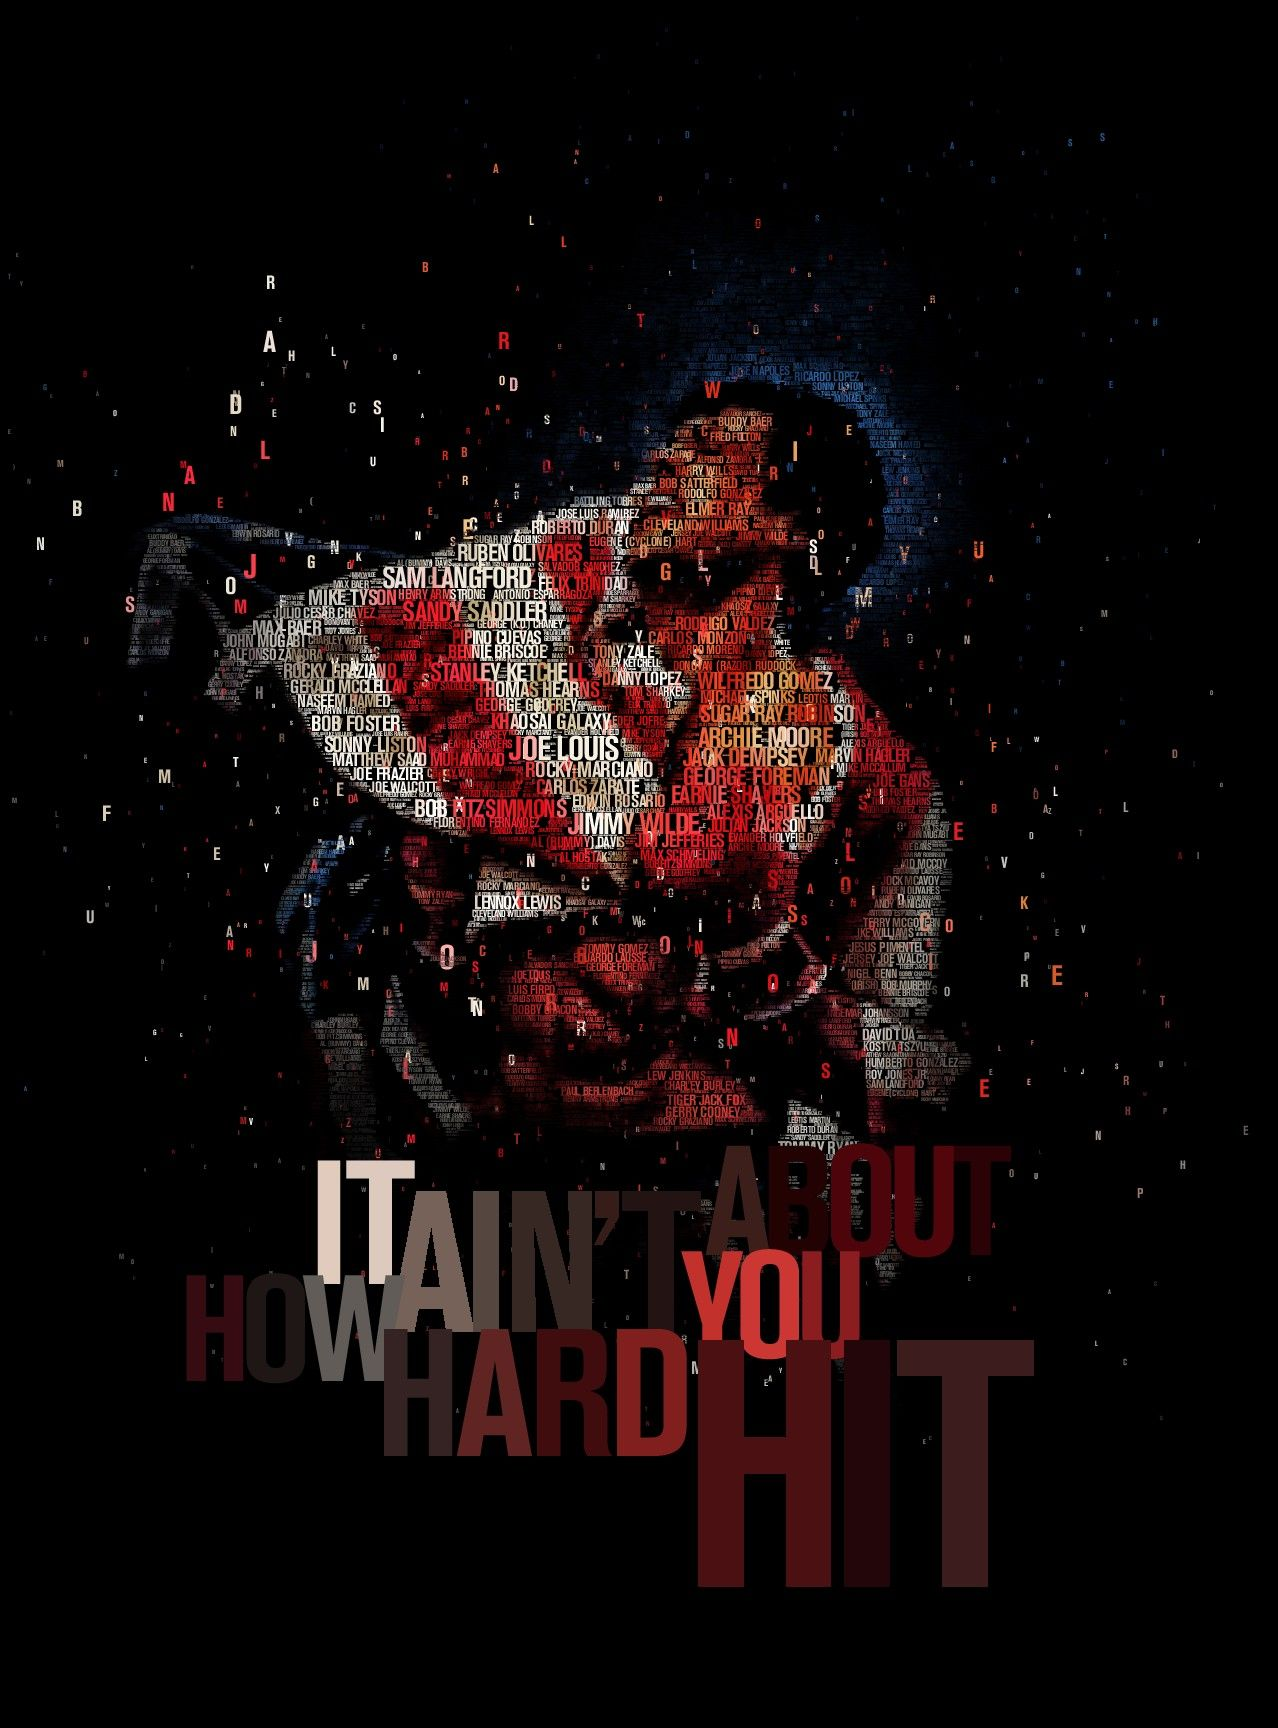 Muhammad Ali Wallpaper Hd Iphone It Aint About How Hard You Hit By Juanosborne Deviantart